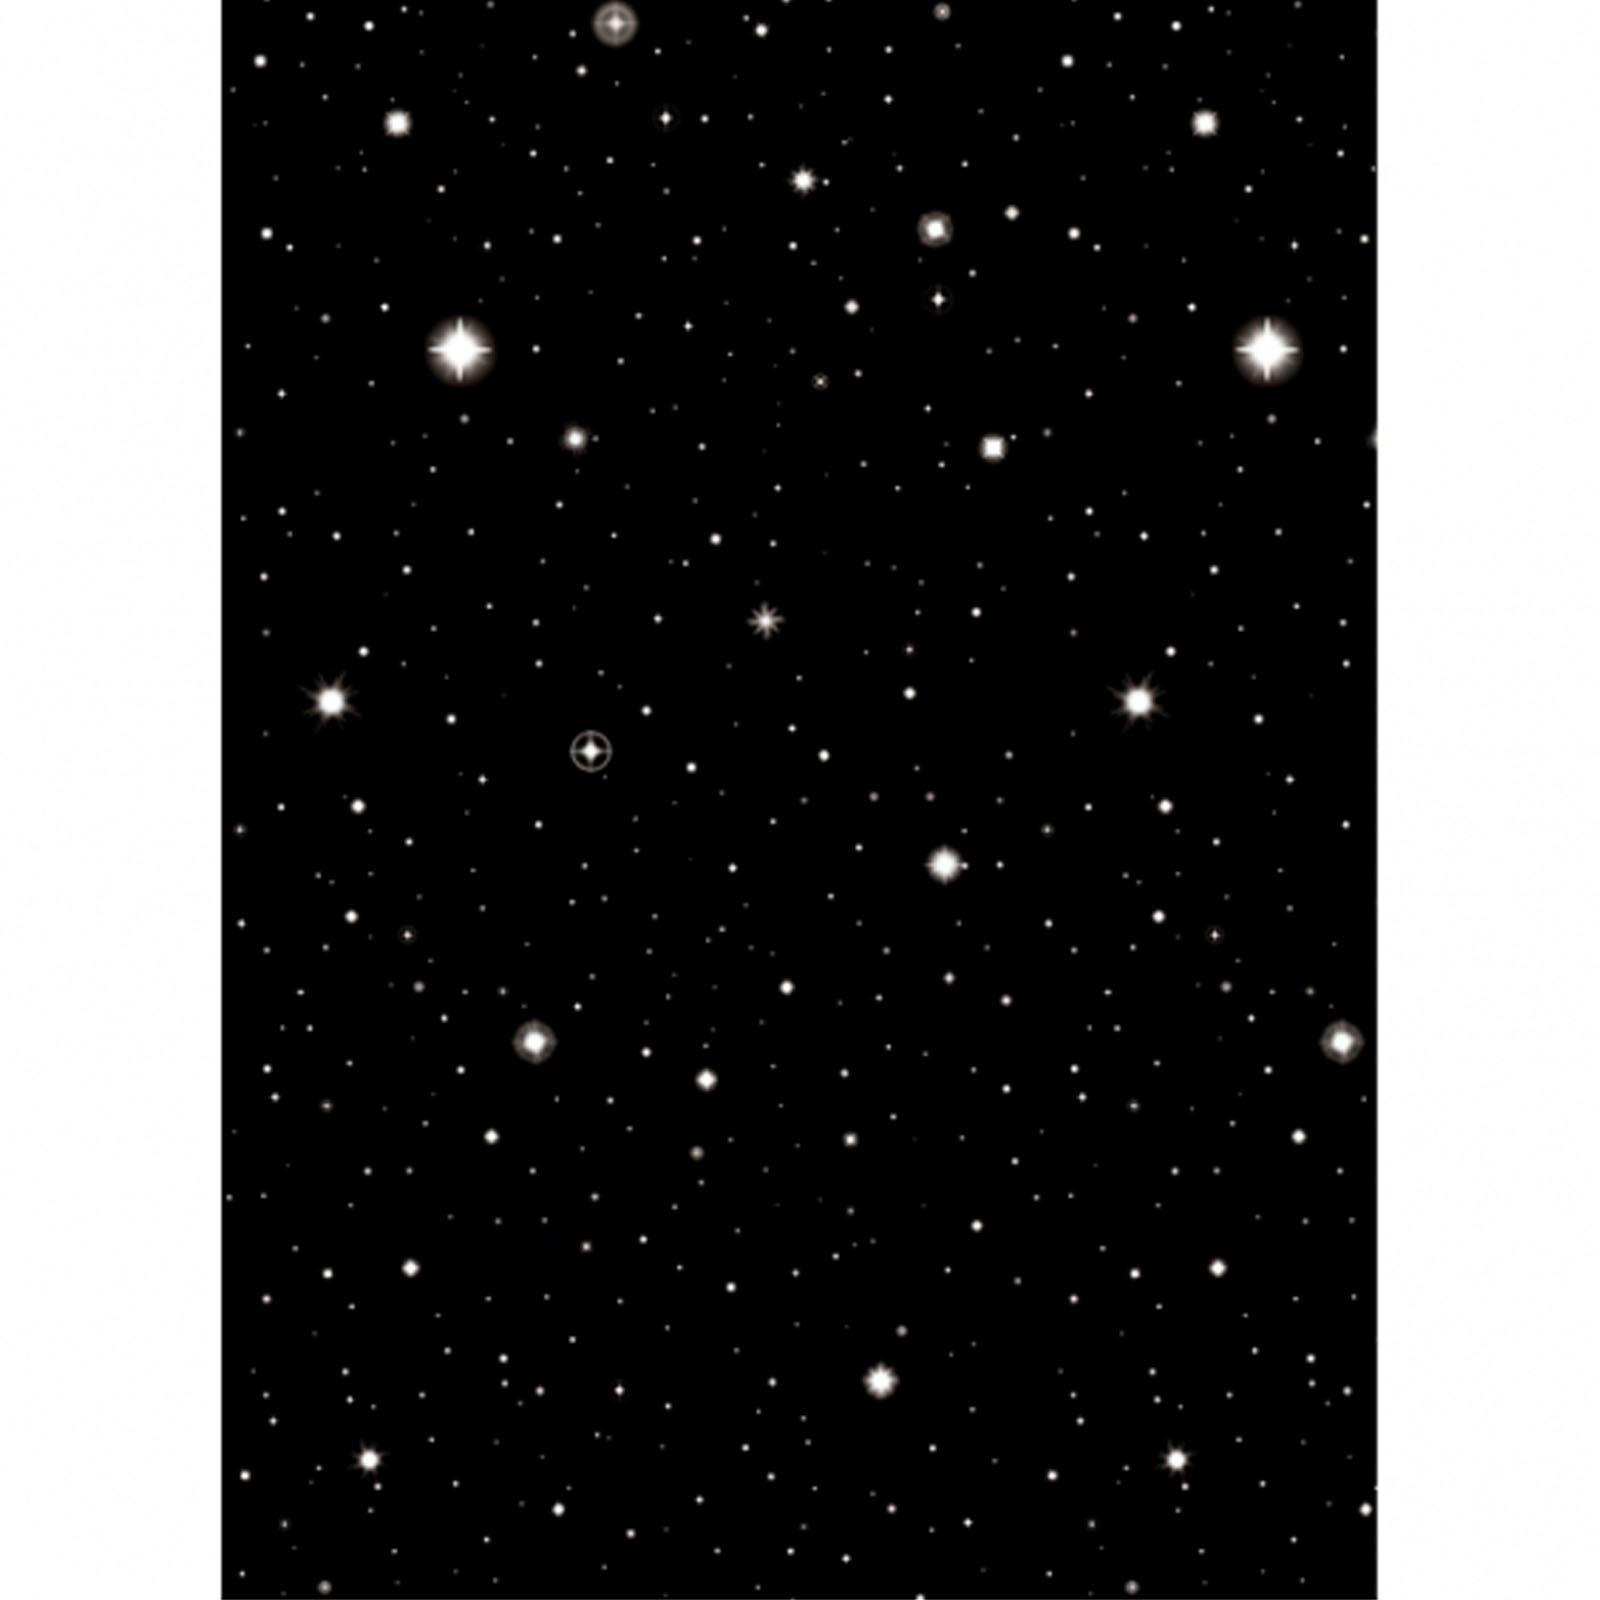 Hollywood Notte Stellata Cielo Sfondo Scenario 40ft152 M Festa Ebay